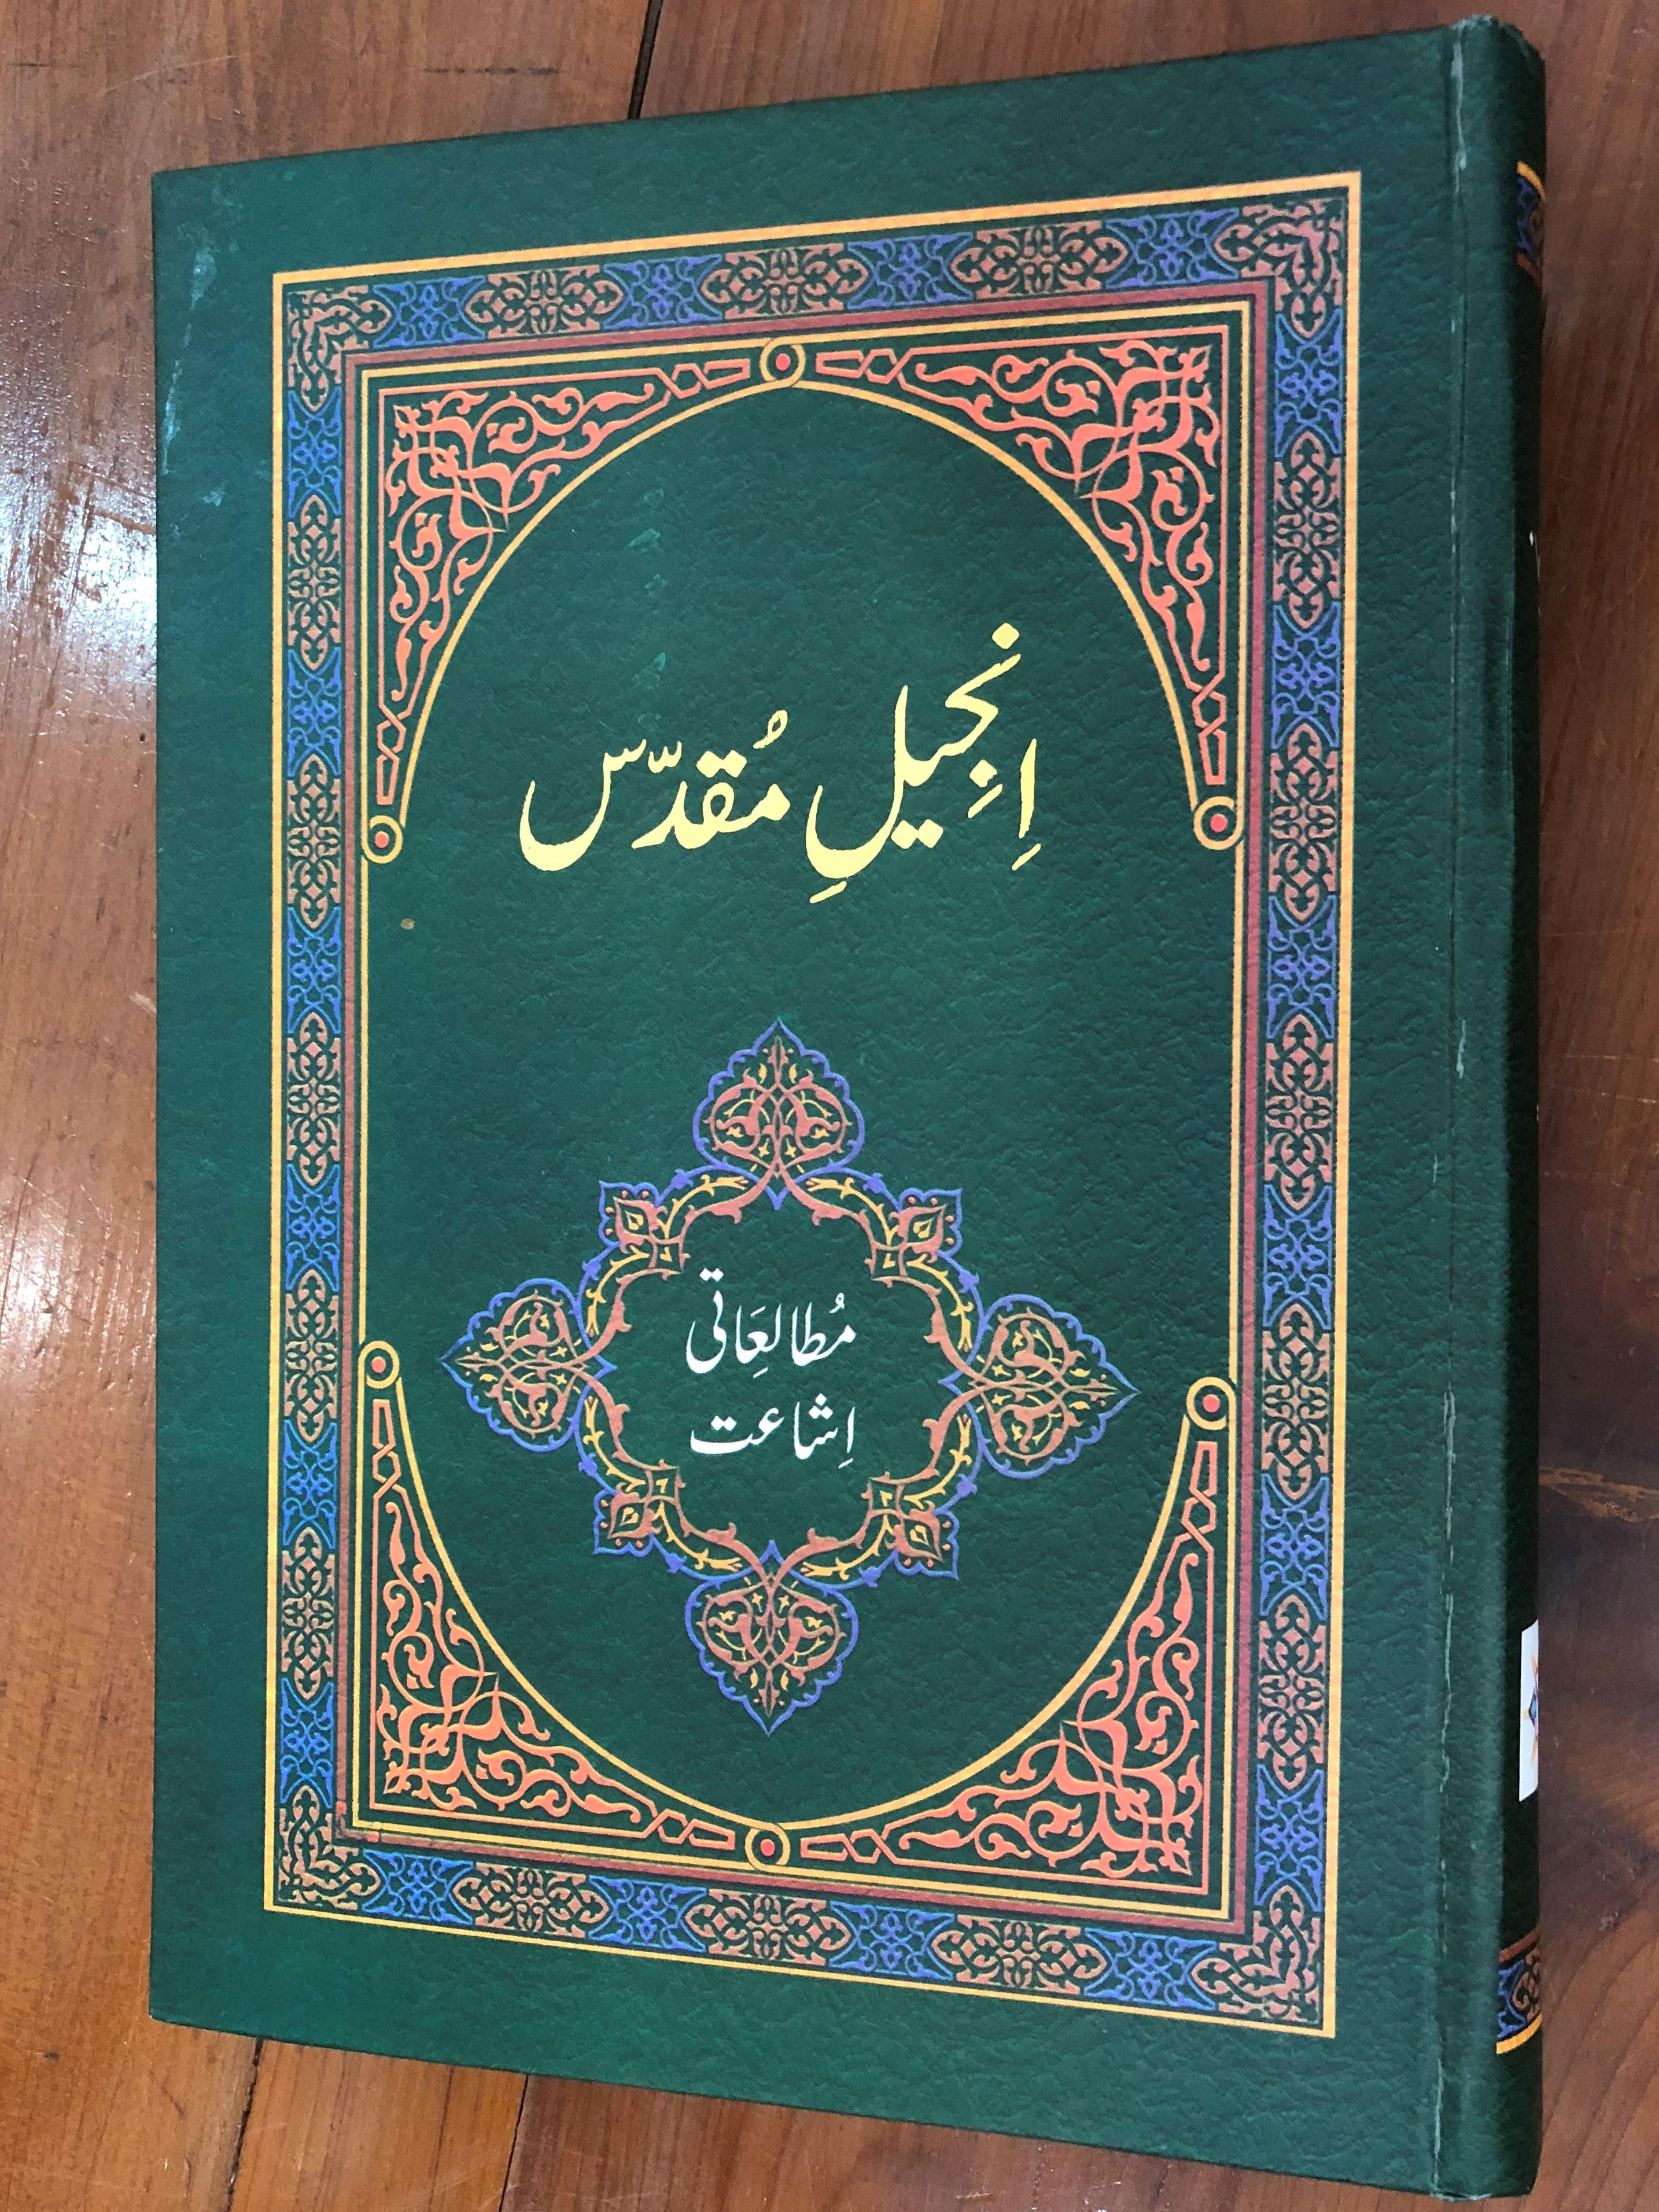 urdu-study-new-testament-2nd-edition-a-real-study-new-testament-pakistan-bible-society-2012-1-.jpg